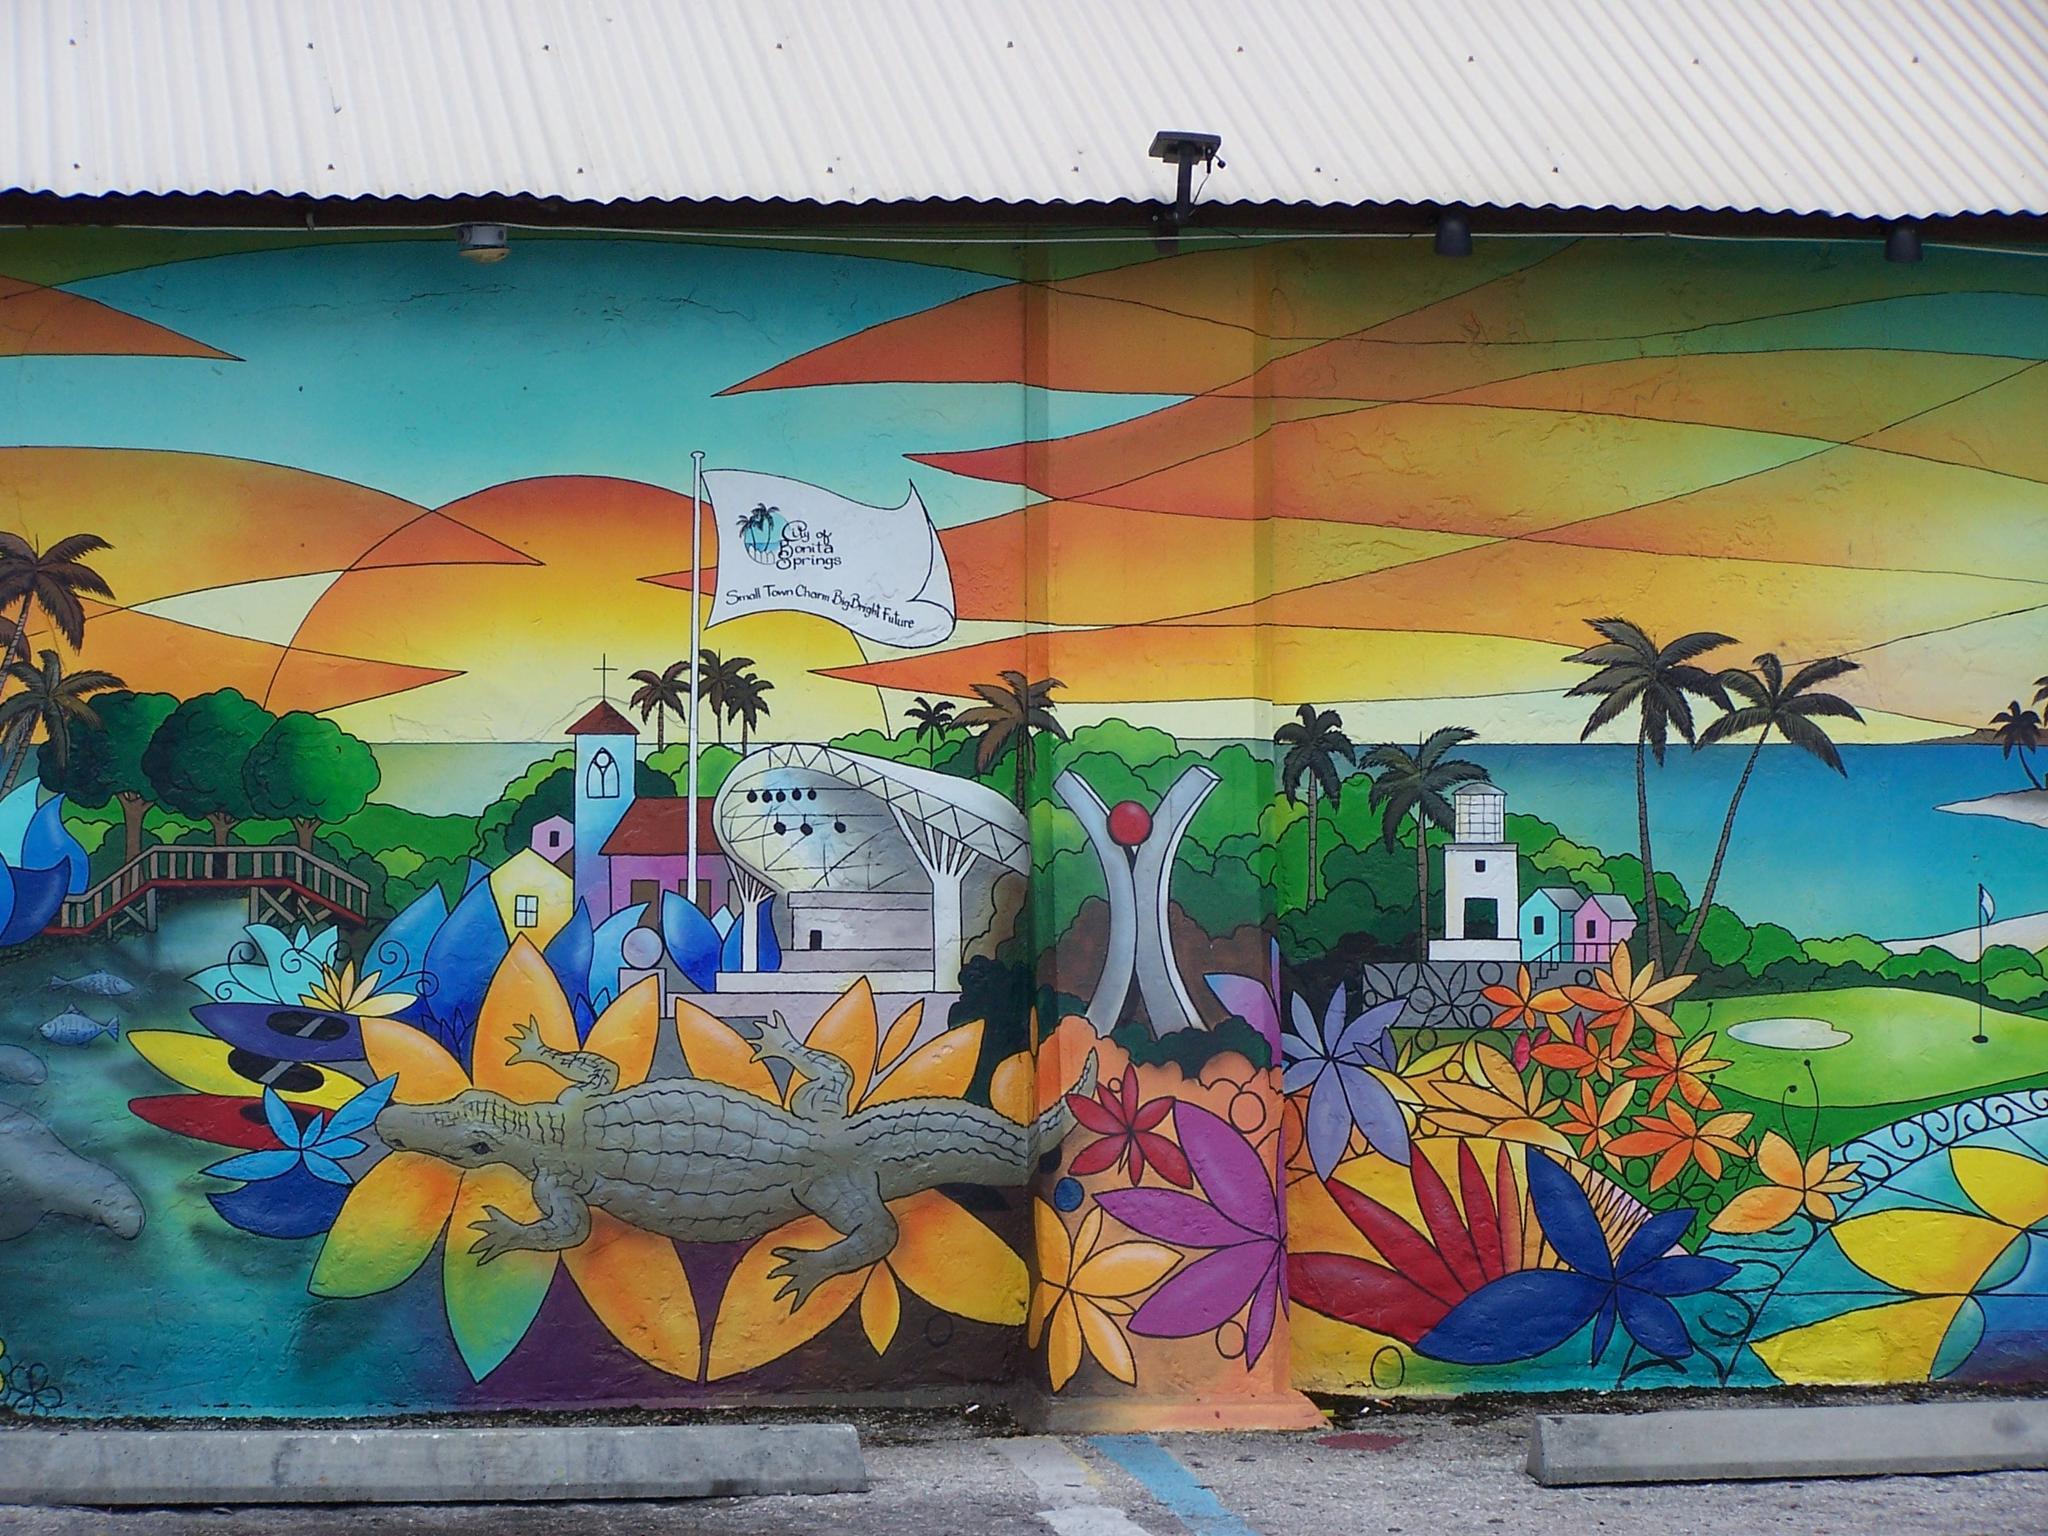 Bonita Mural by Todd